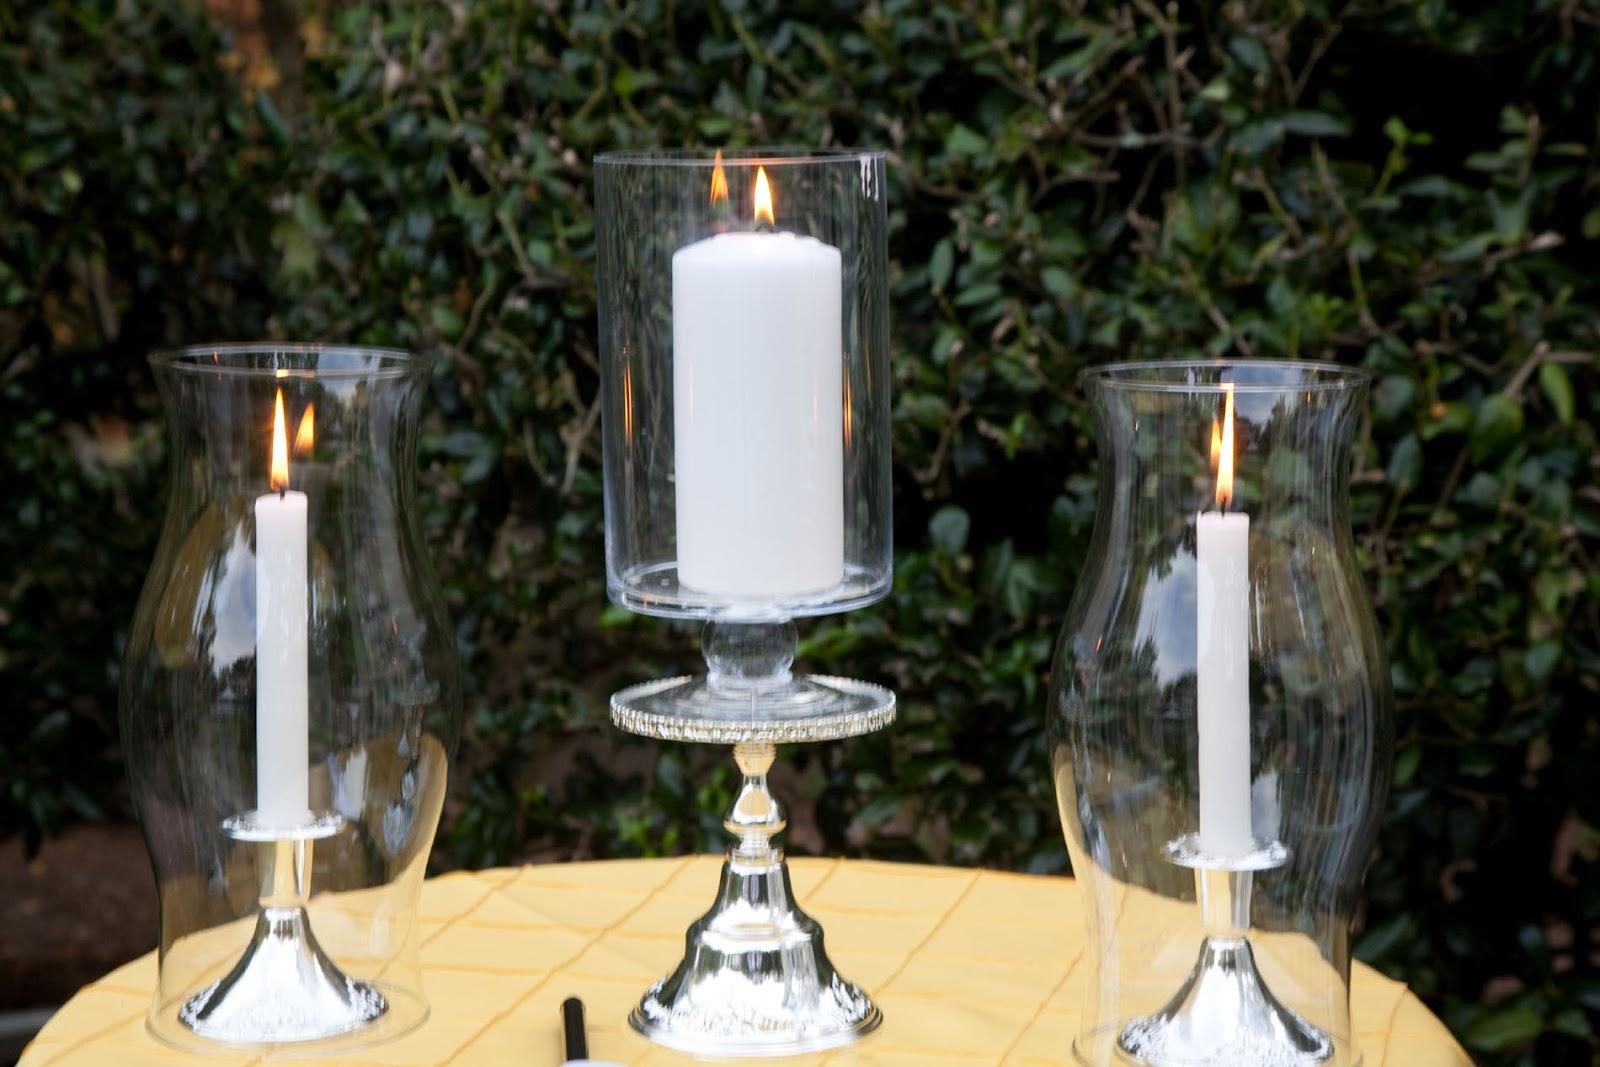 Ooh-La-La Vintage Wedding Rentals: January 2013